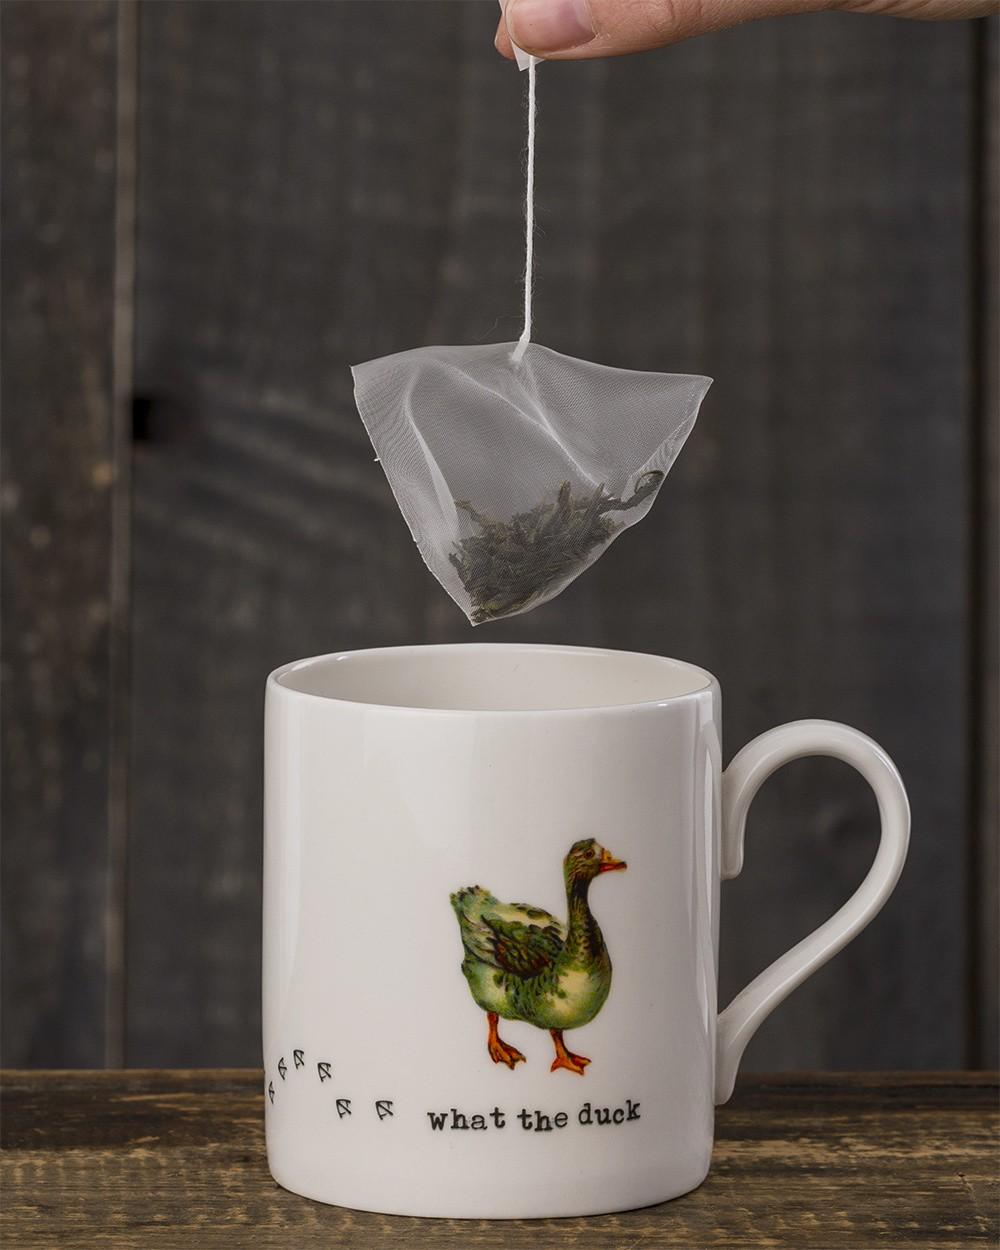 What the Duck Mug